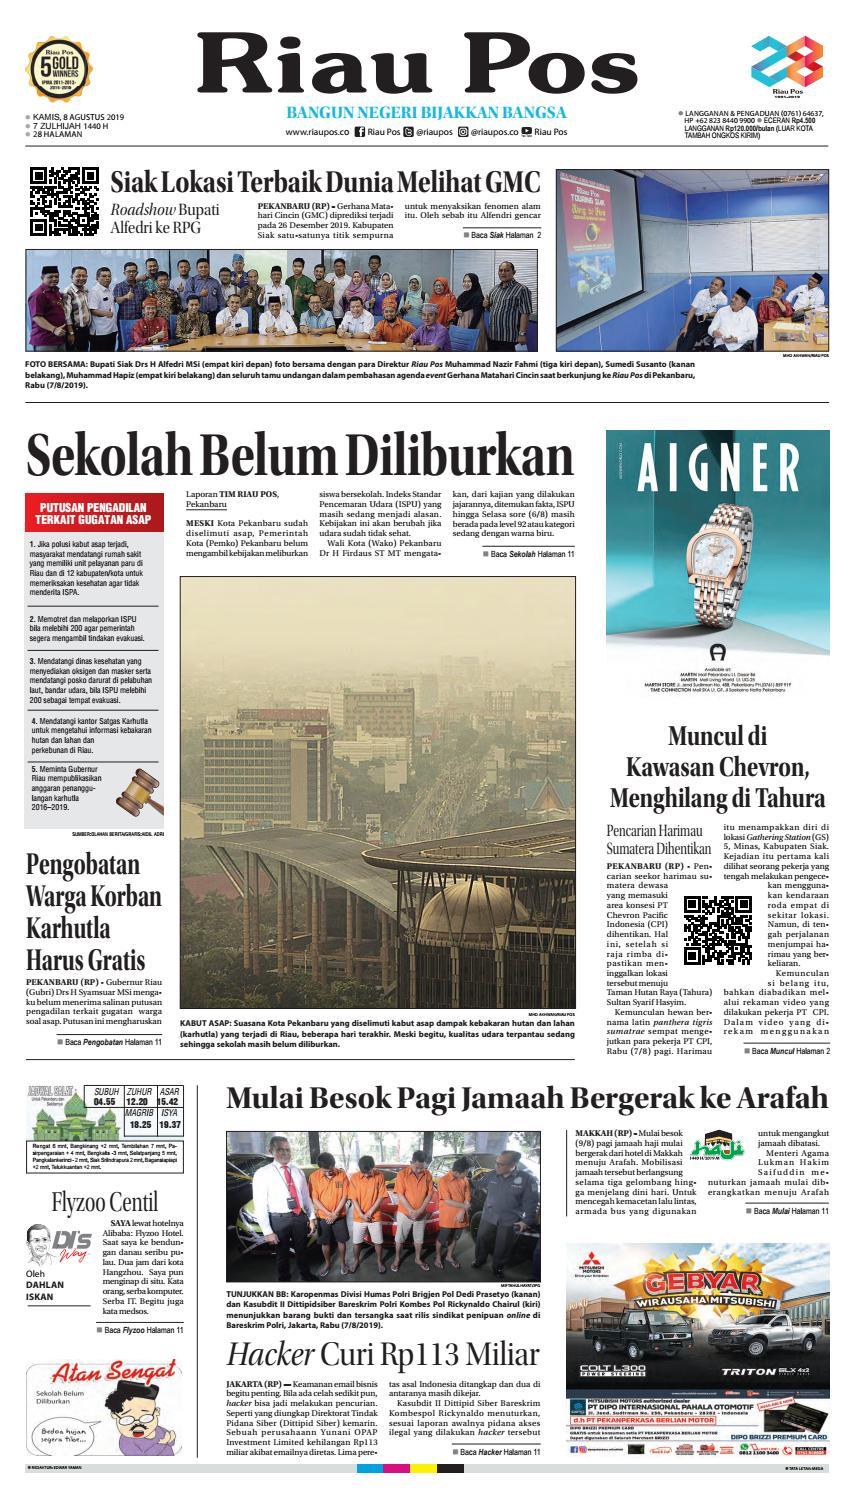 Riau Pos Edisi 08 Agustus 2019 By Riau Pos Issuu